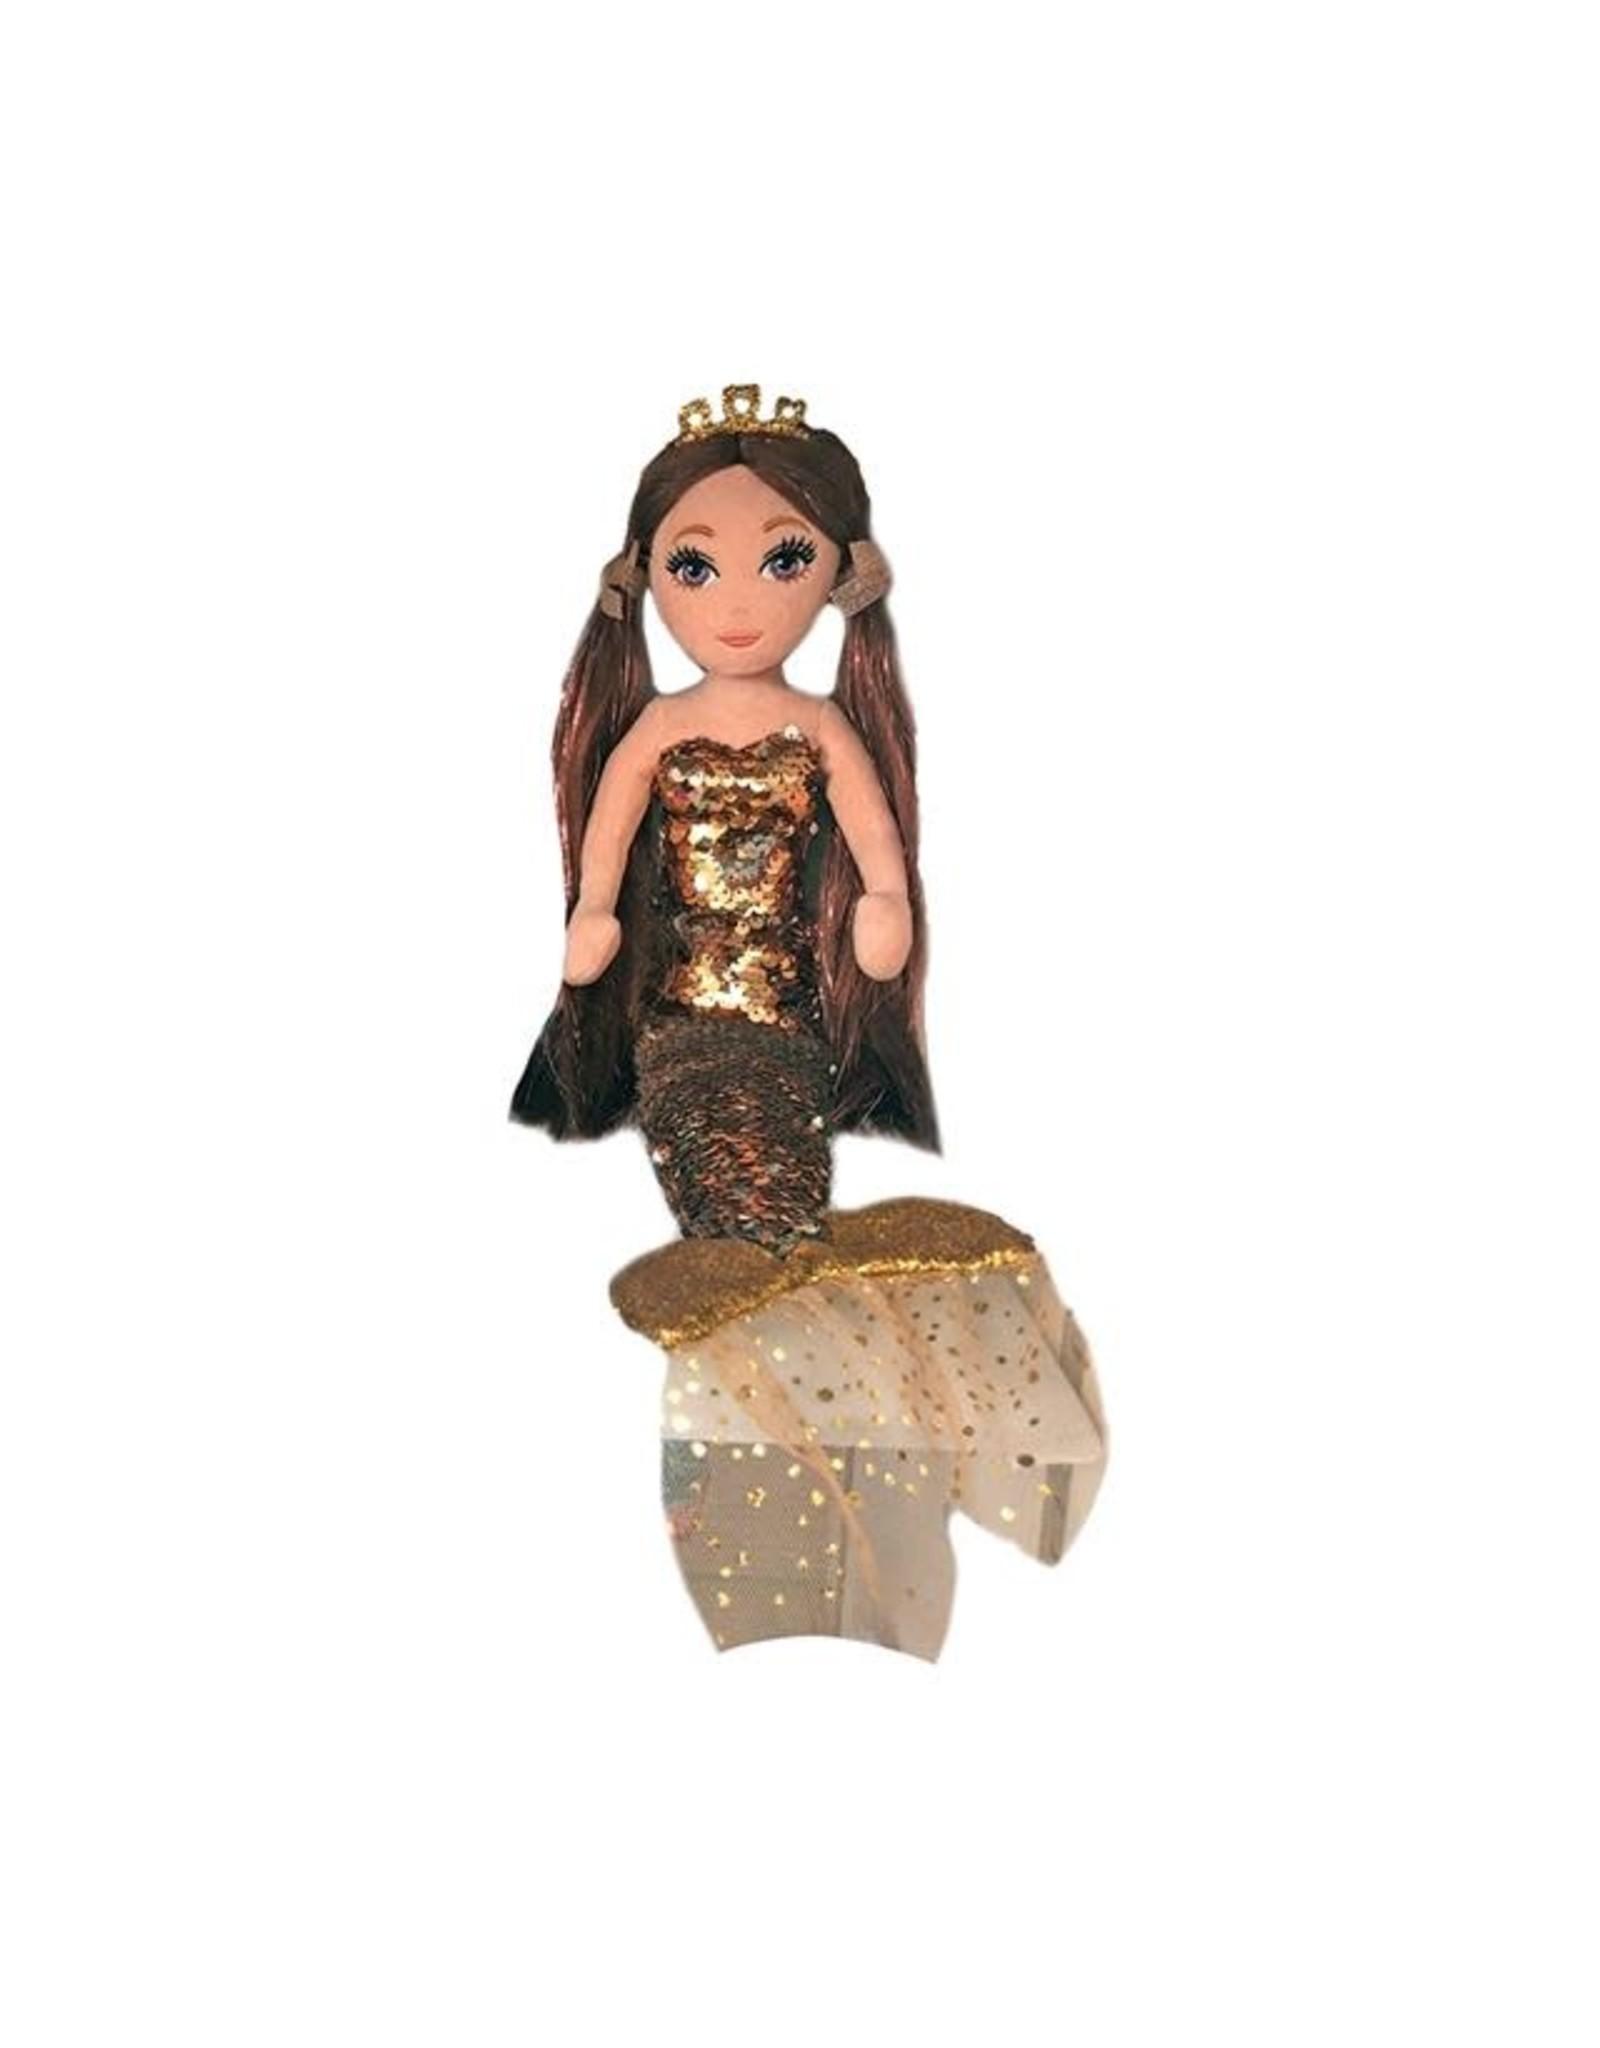 Ty Ginger - Mermaid Sequin Brown Lrg